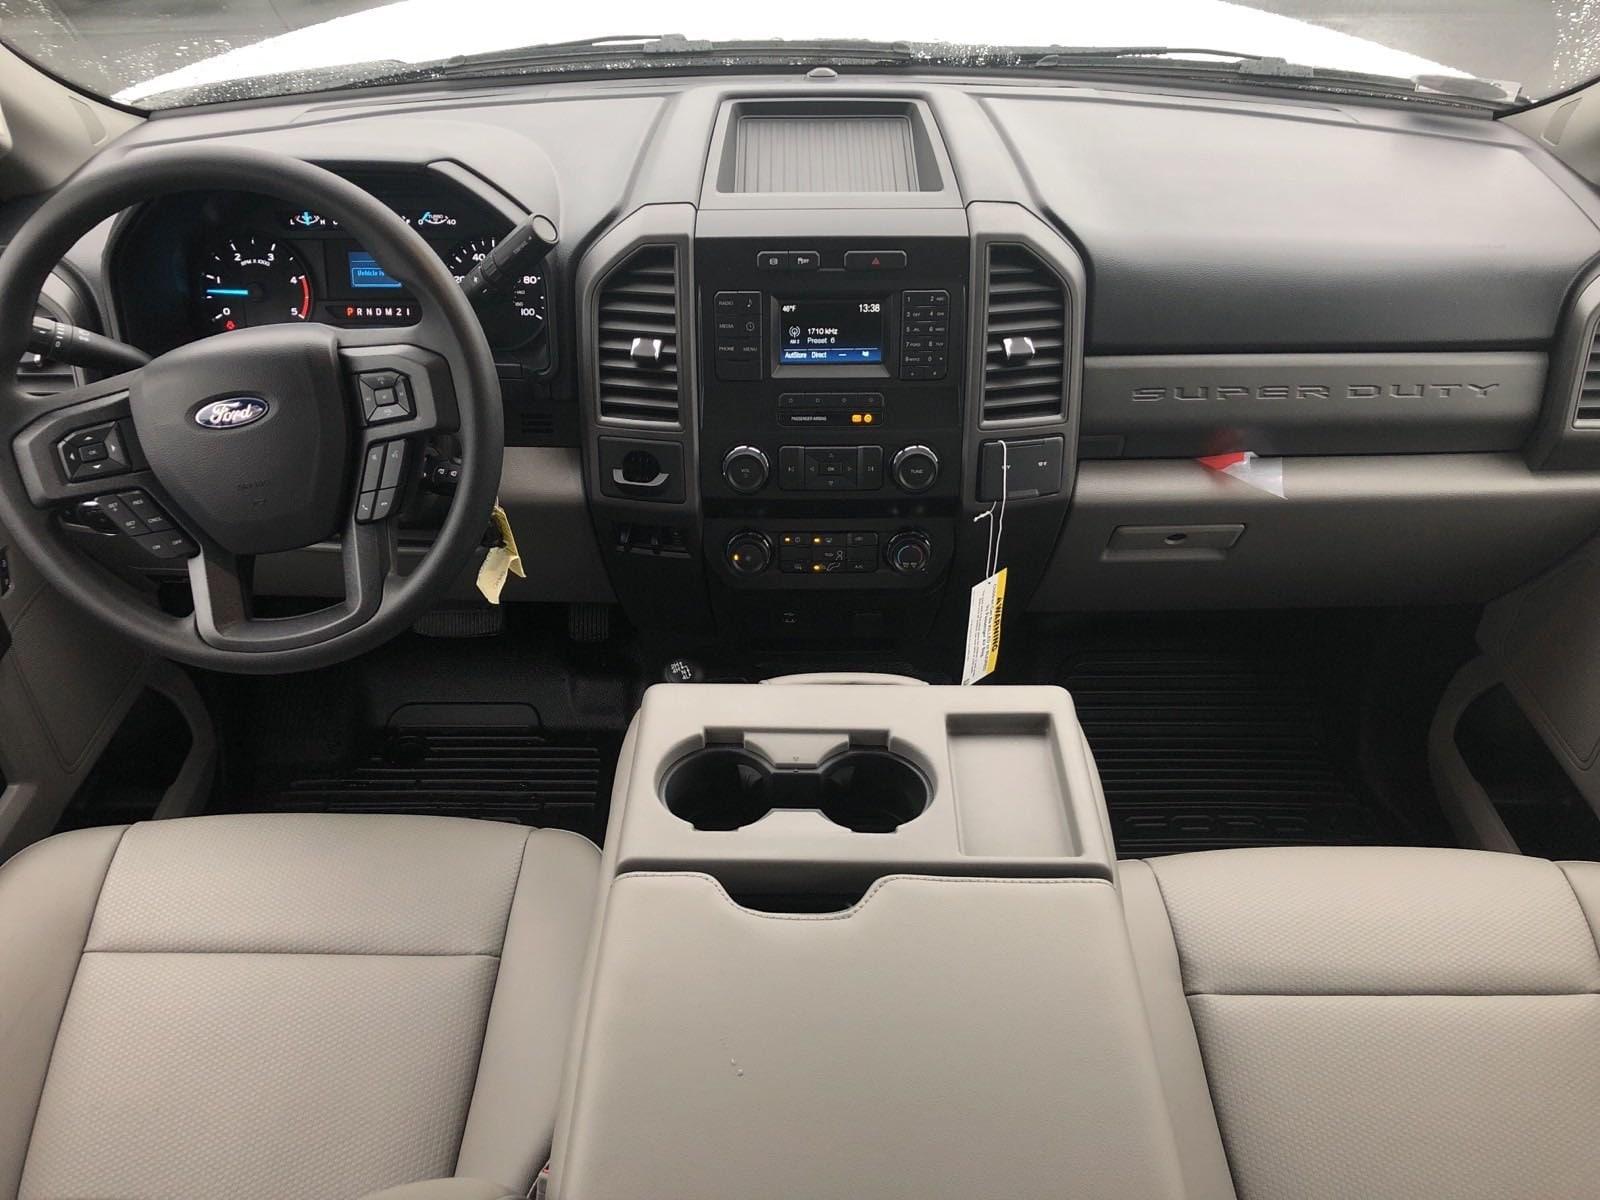 2019 F-550 Super Cab DRW 4x4, Knapheide Contractor Body #299961 - photo 16